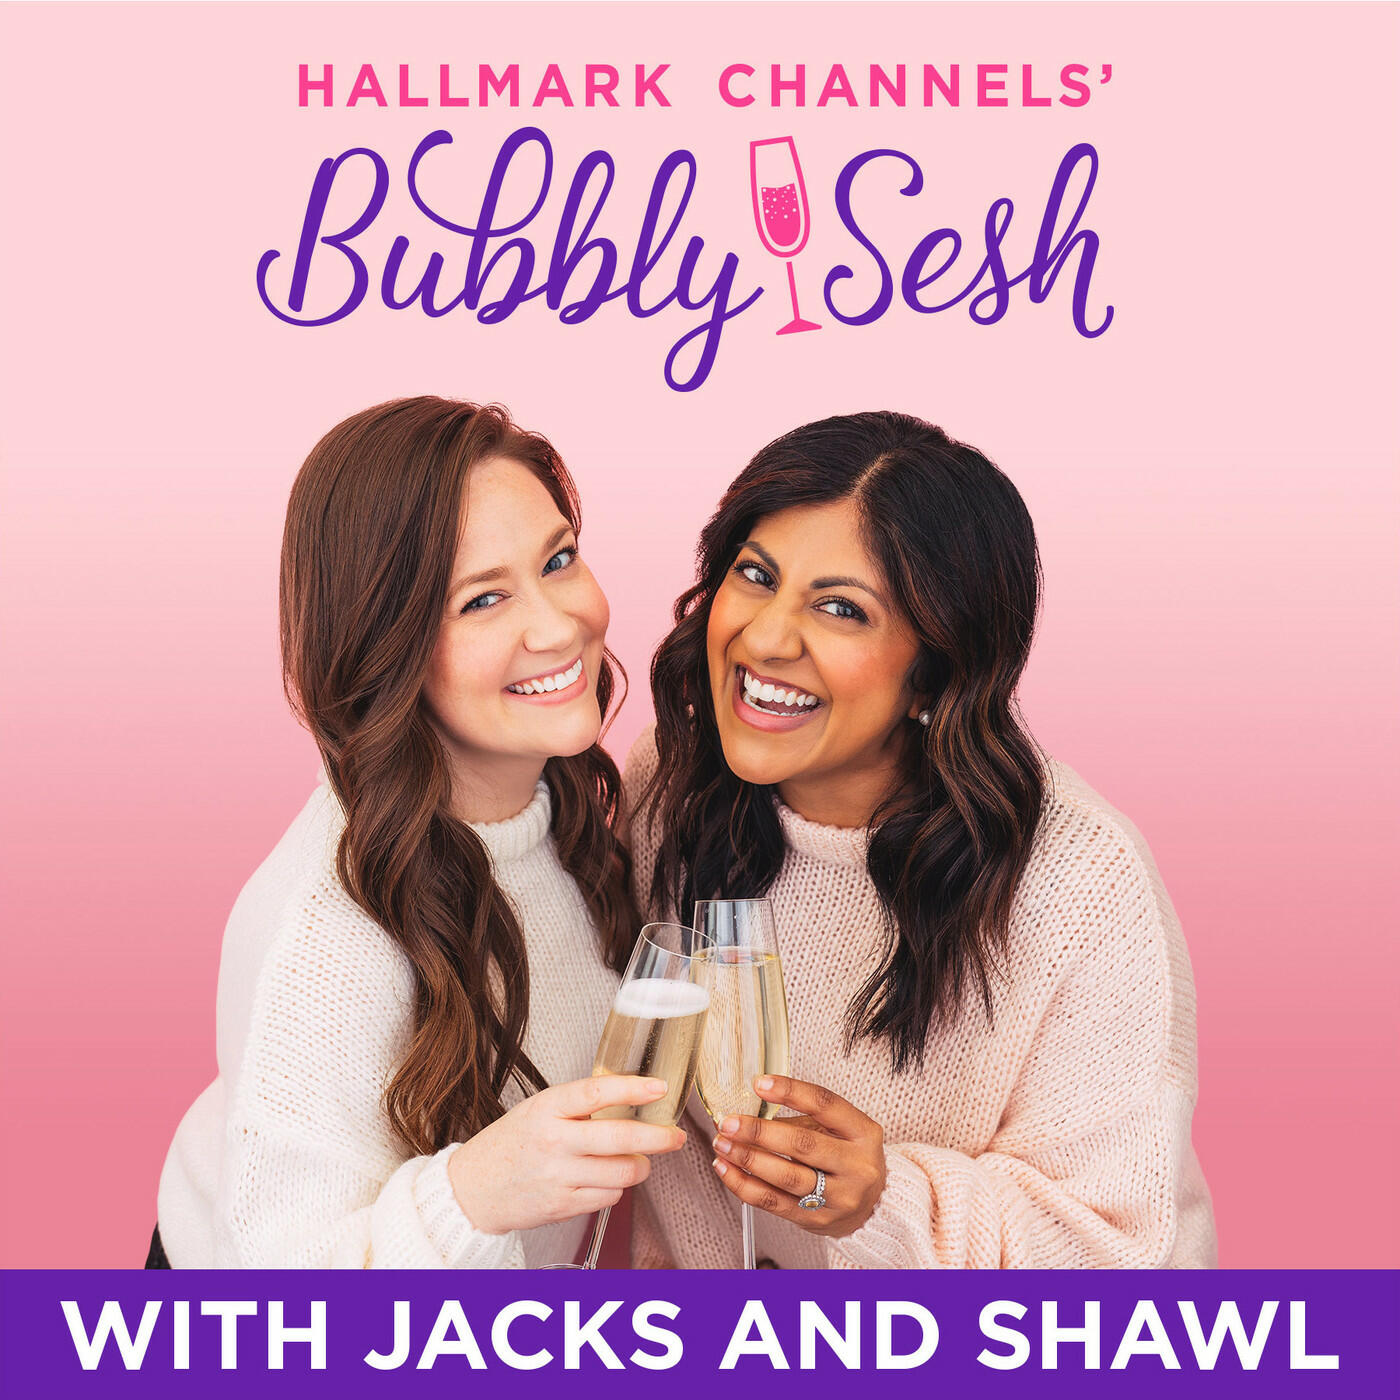 Hallmark Channels' Bubbly Sesh